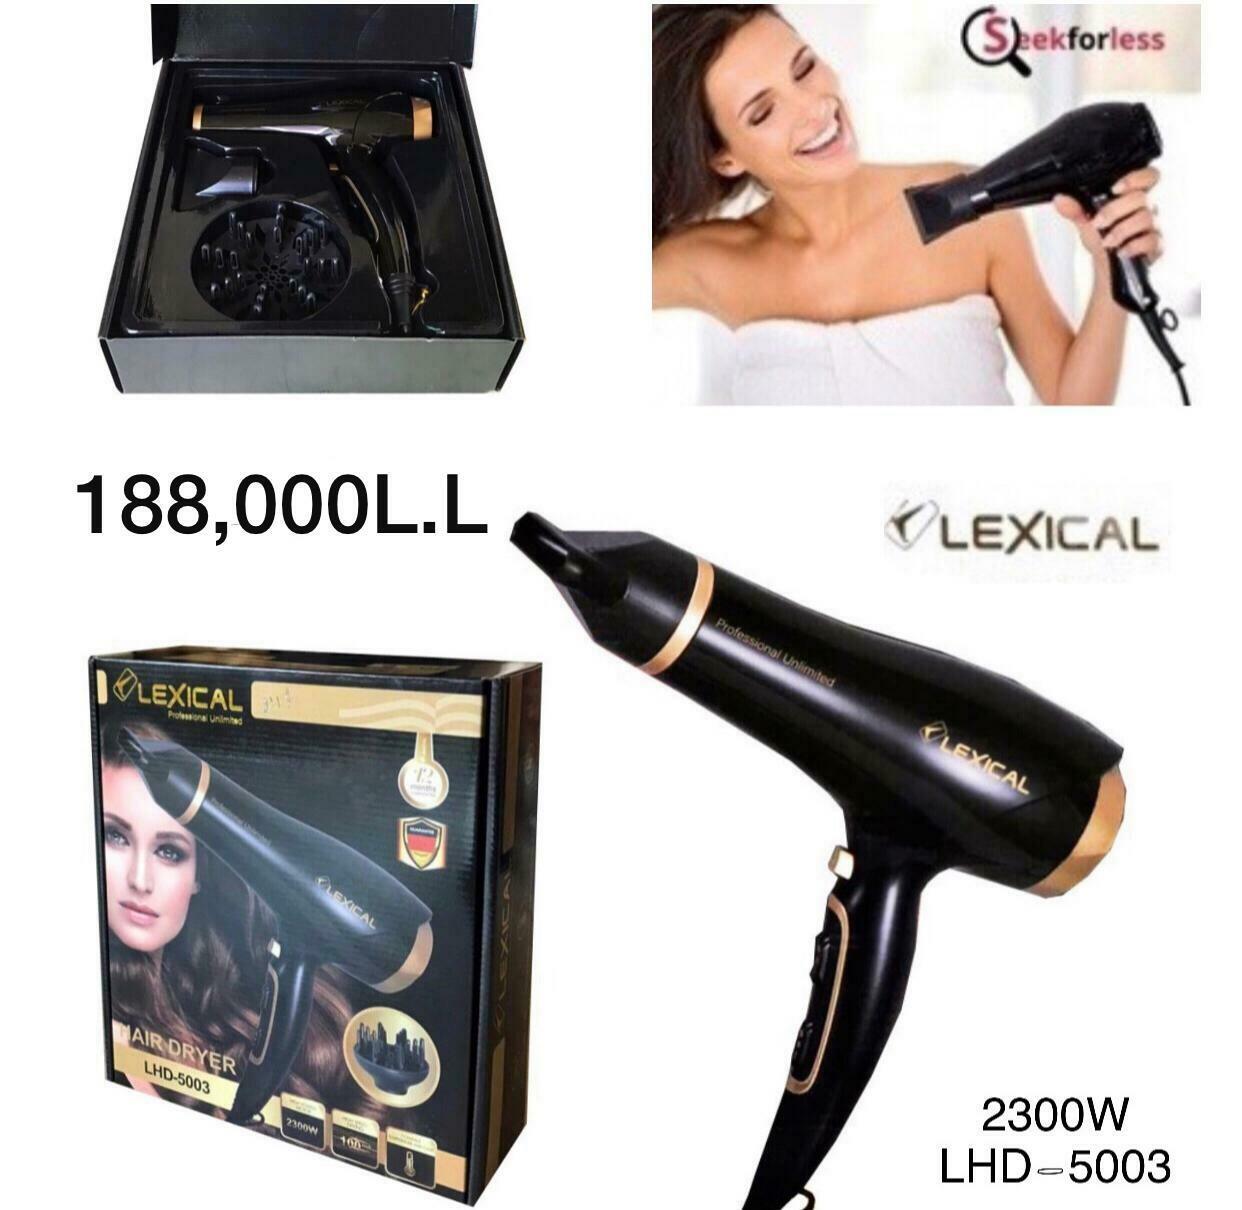 """LEXICAL"" Hair Dryer LHD-5003"